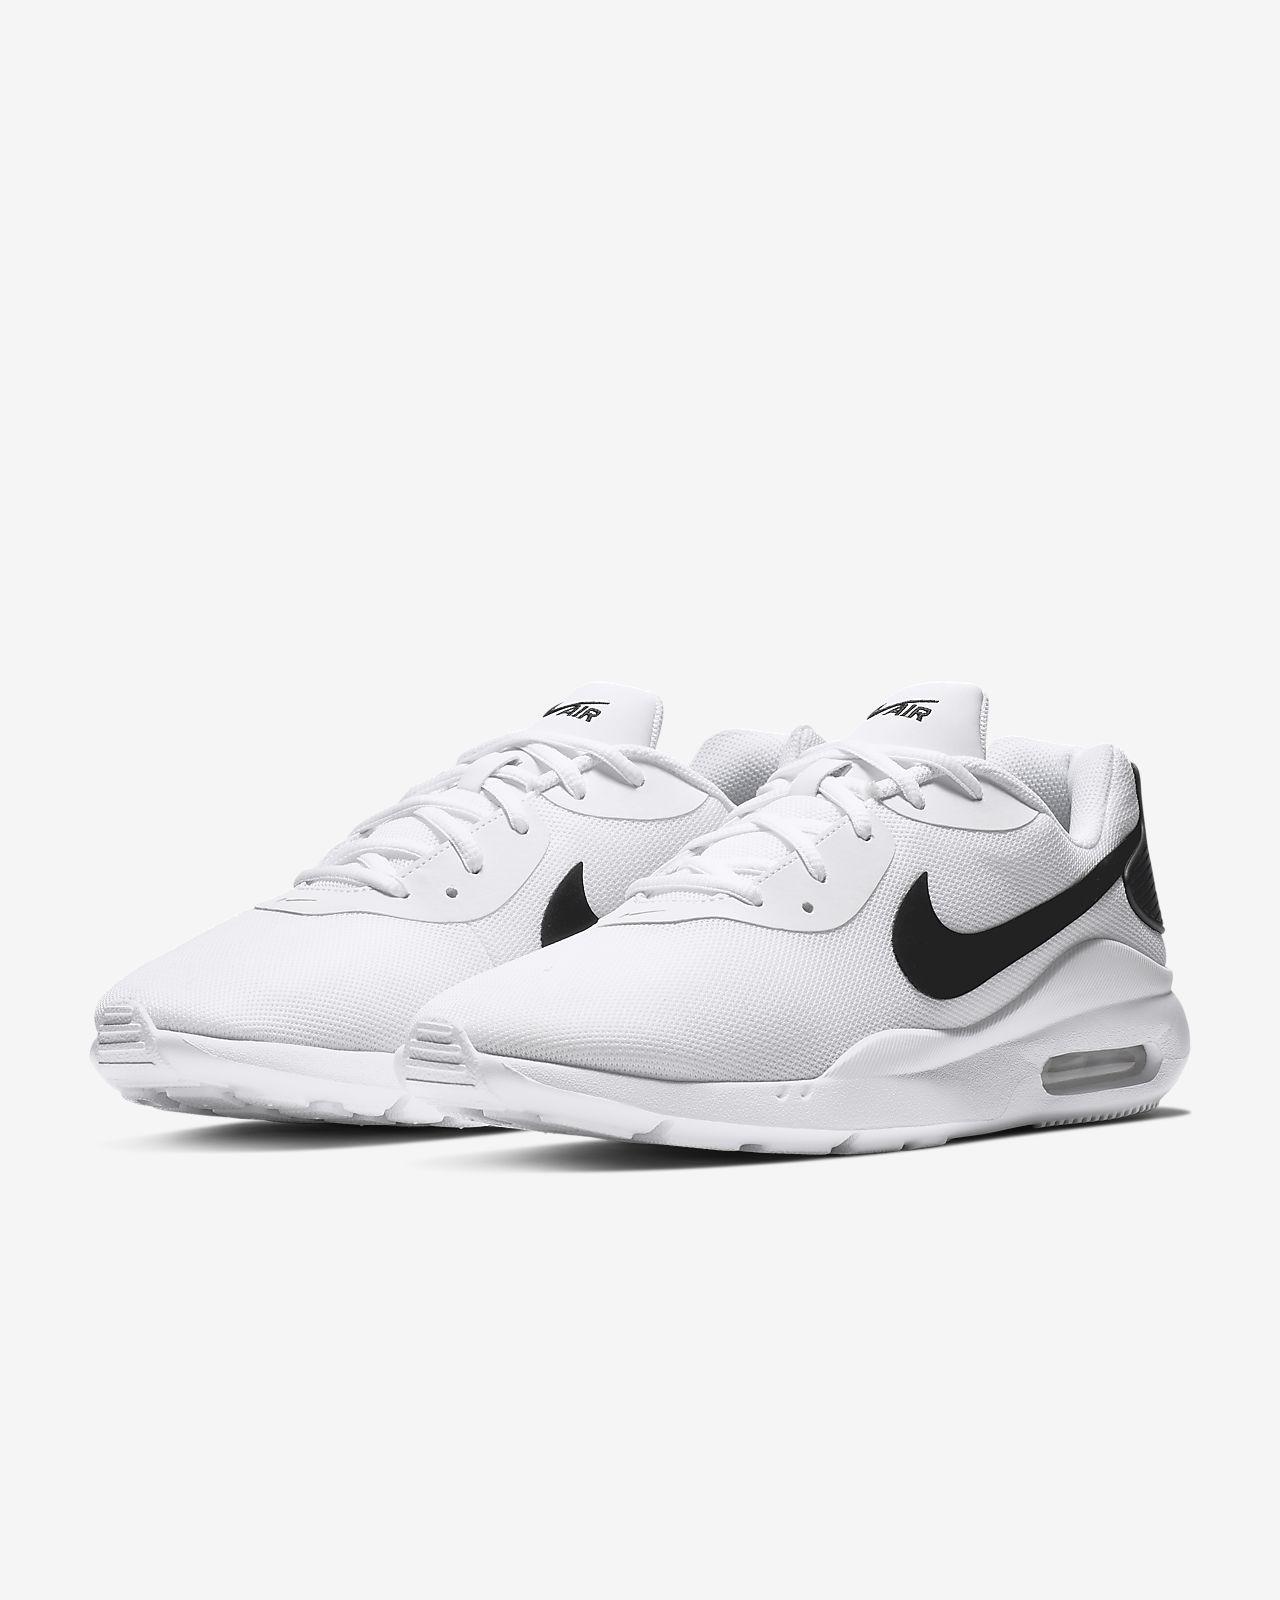 df94f10441d67 Nike Men's Shoe Oketo in 2019 | Father's Day / Birthday / Christmas ...